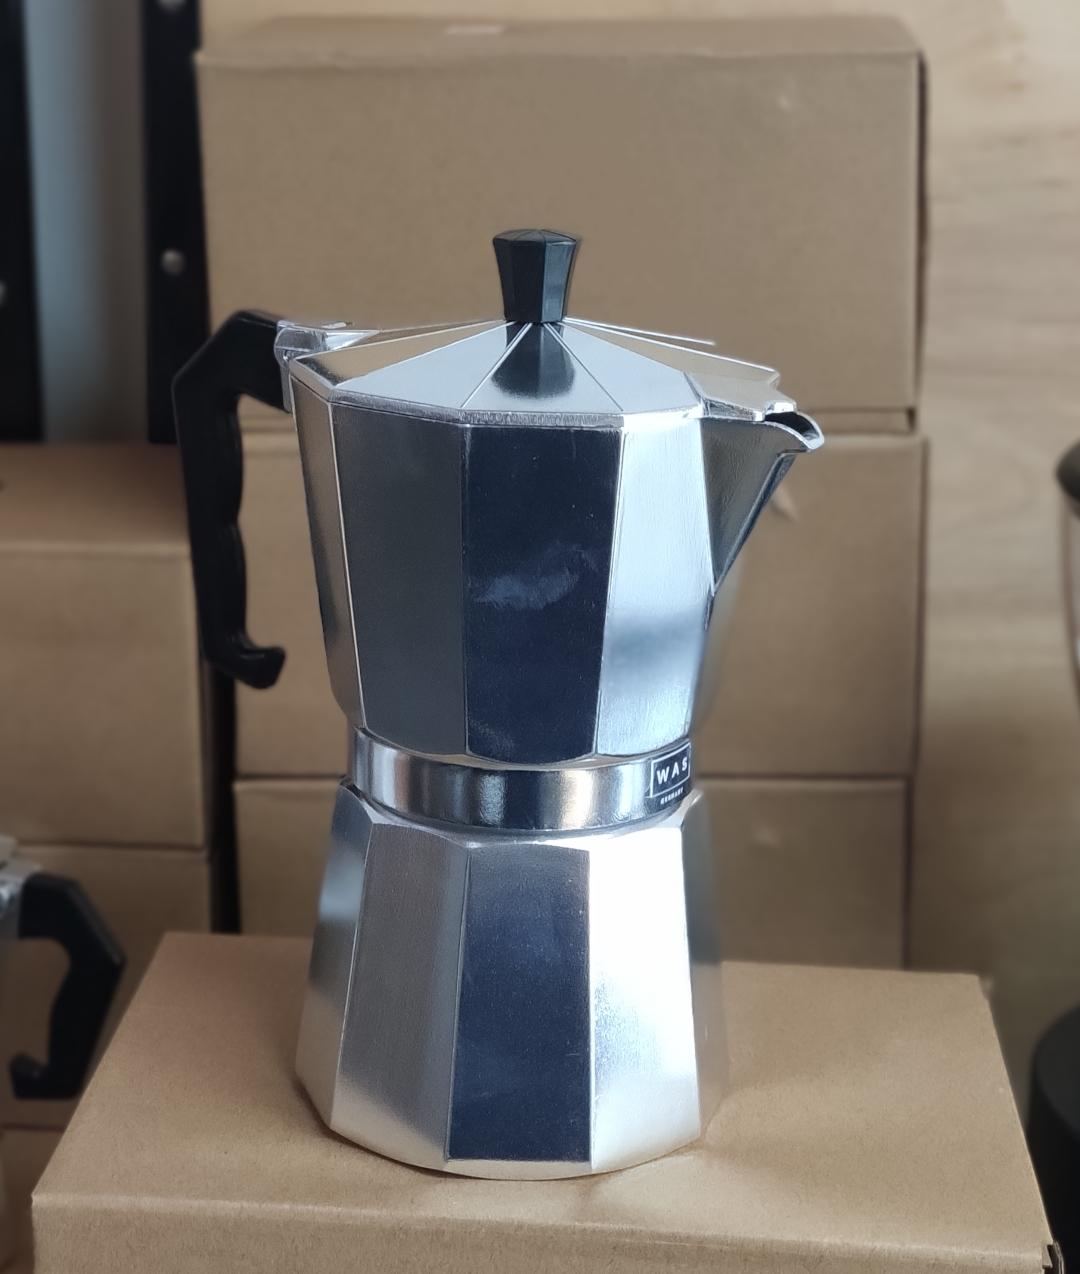 Espressokocher 6 Tassen